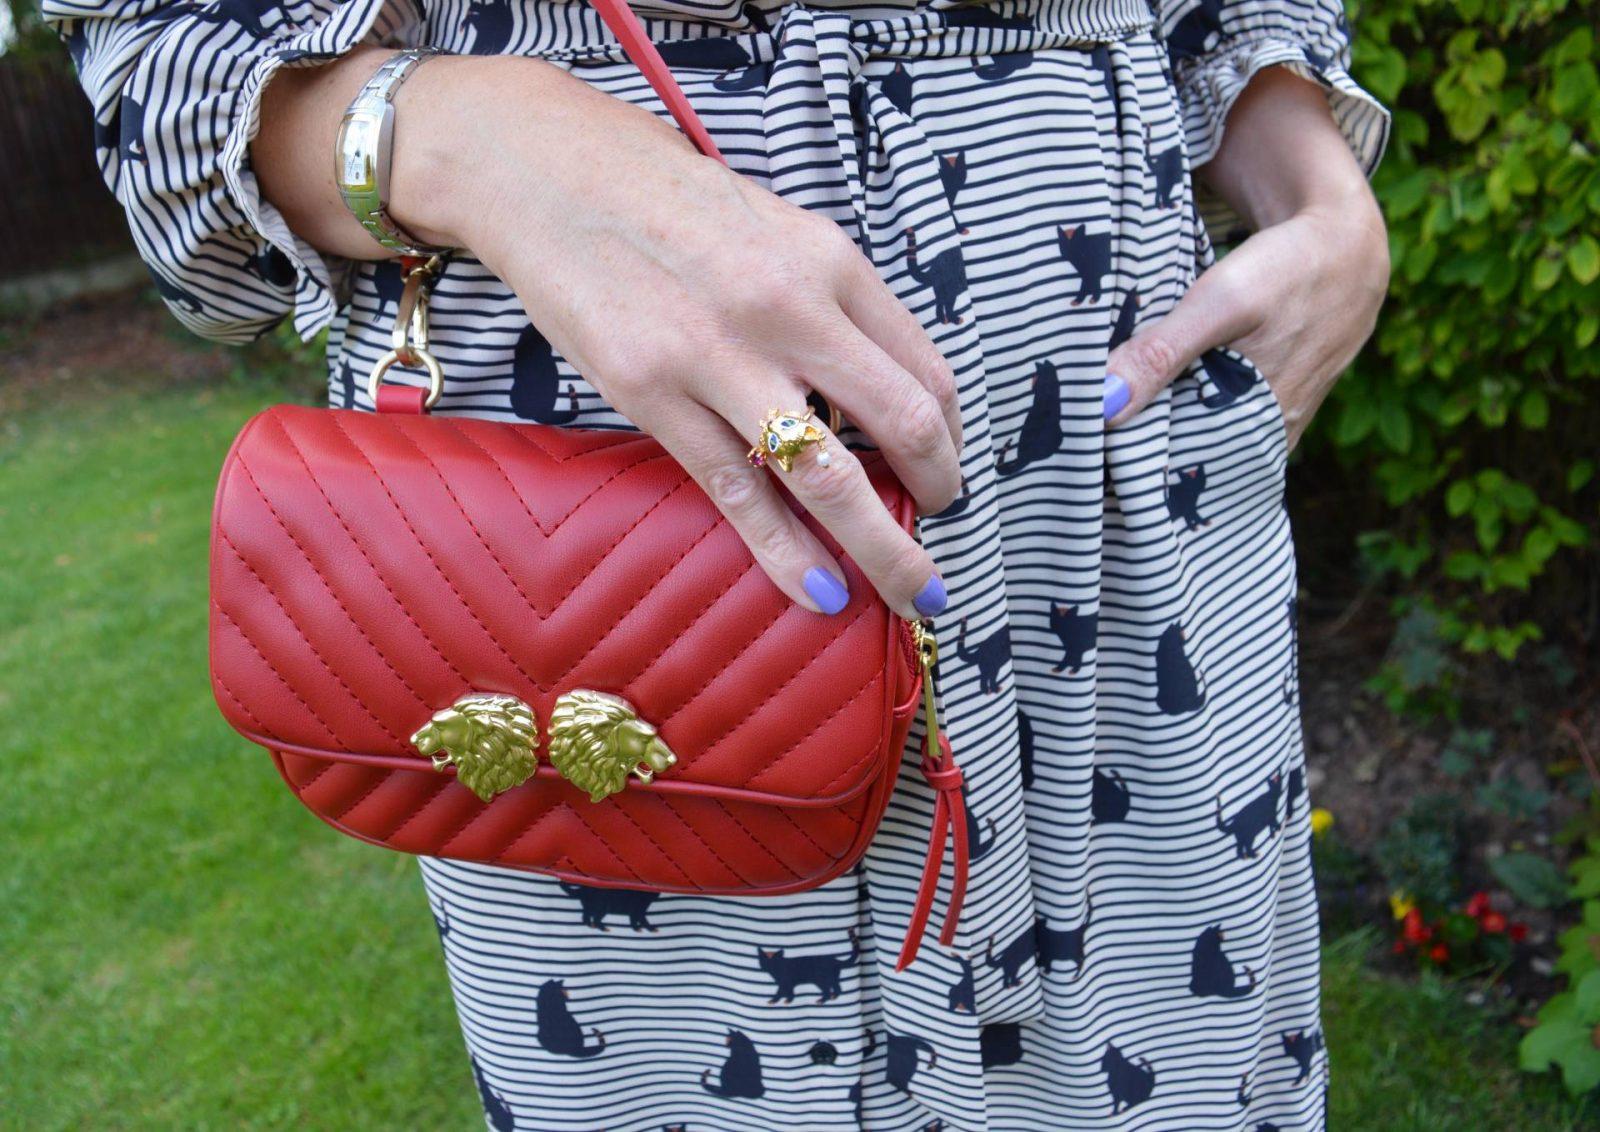 Cat print shirt dress with red accessories, Les Nereides cat ring, Zara red belt bag